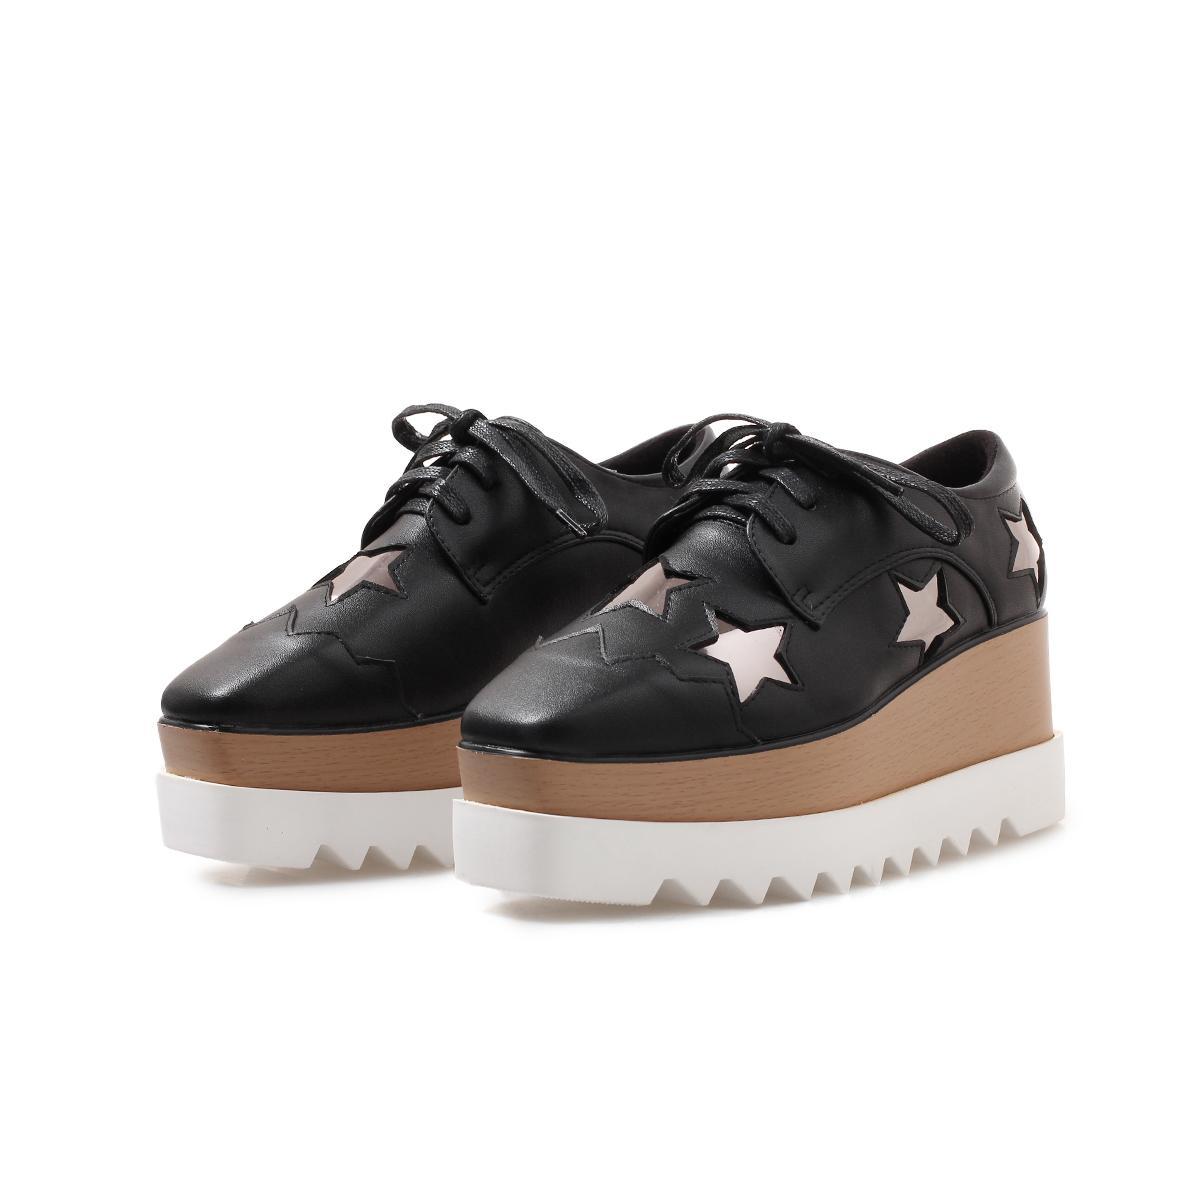 Stella Platform Shoes women Thick